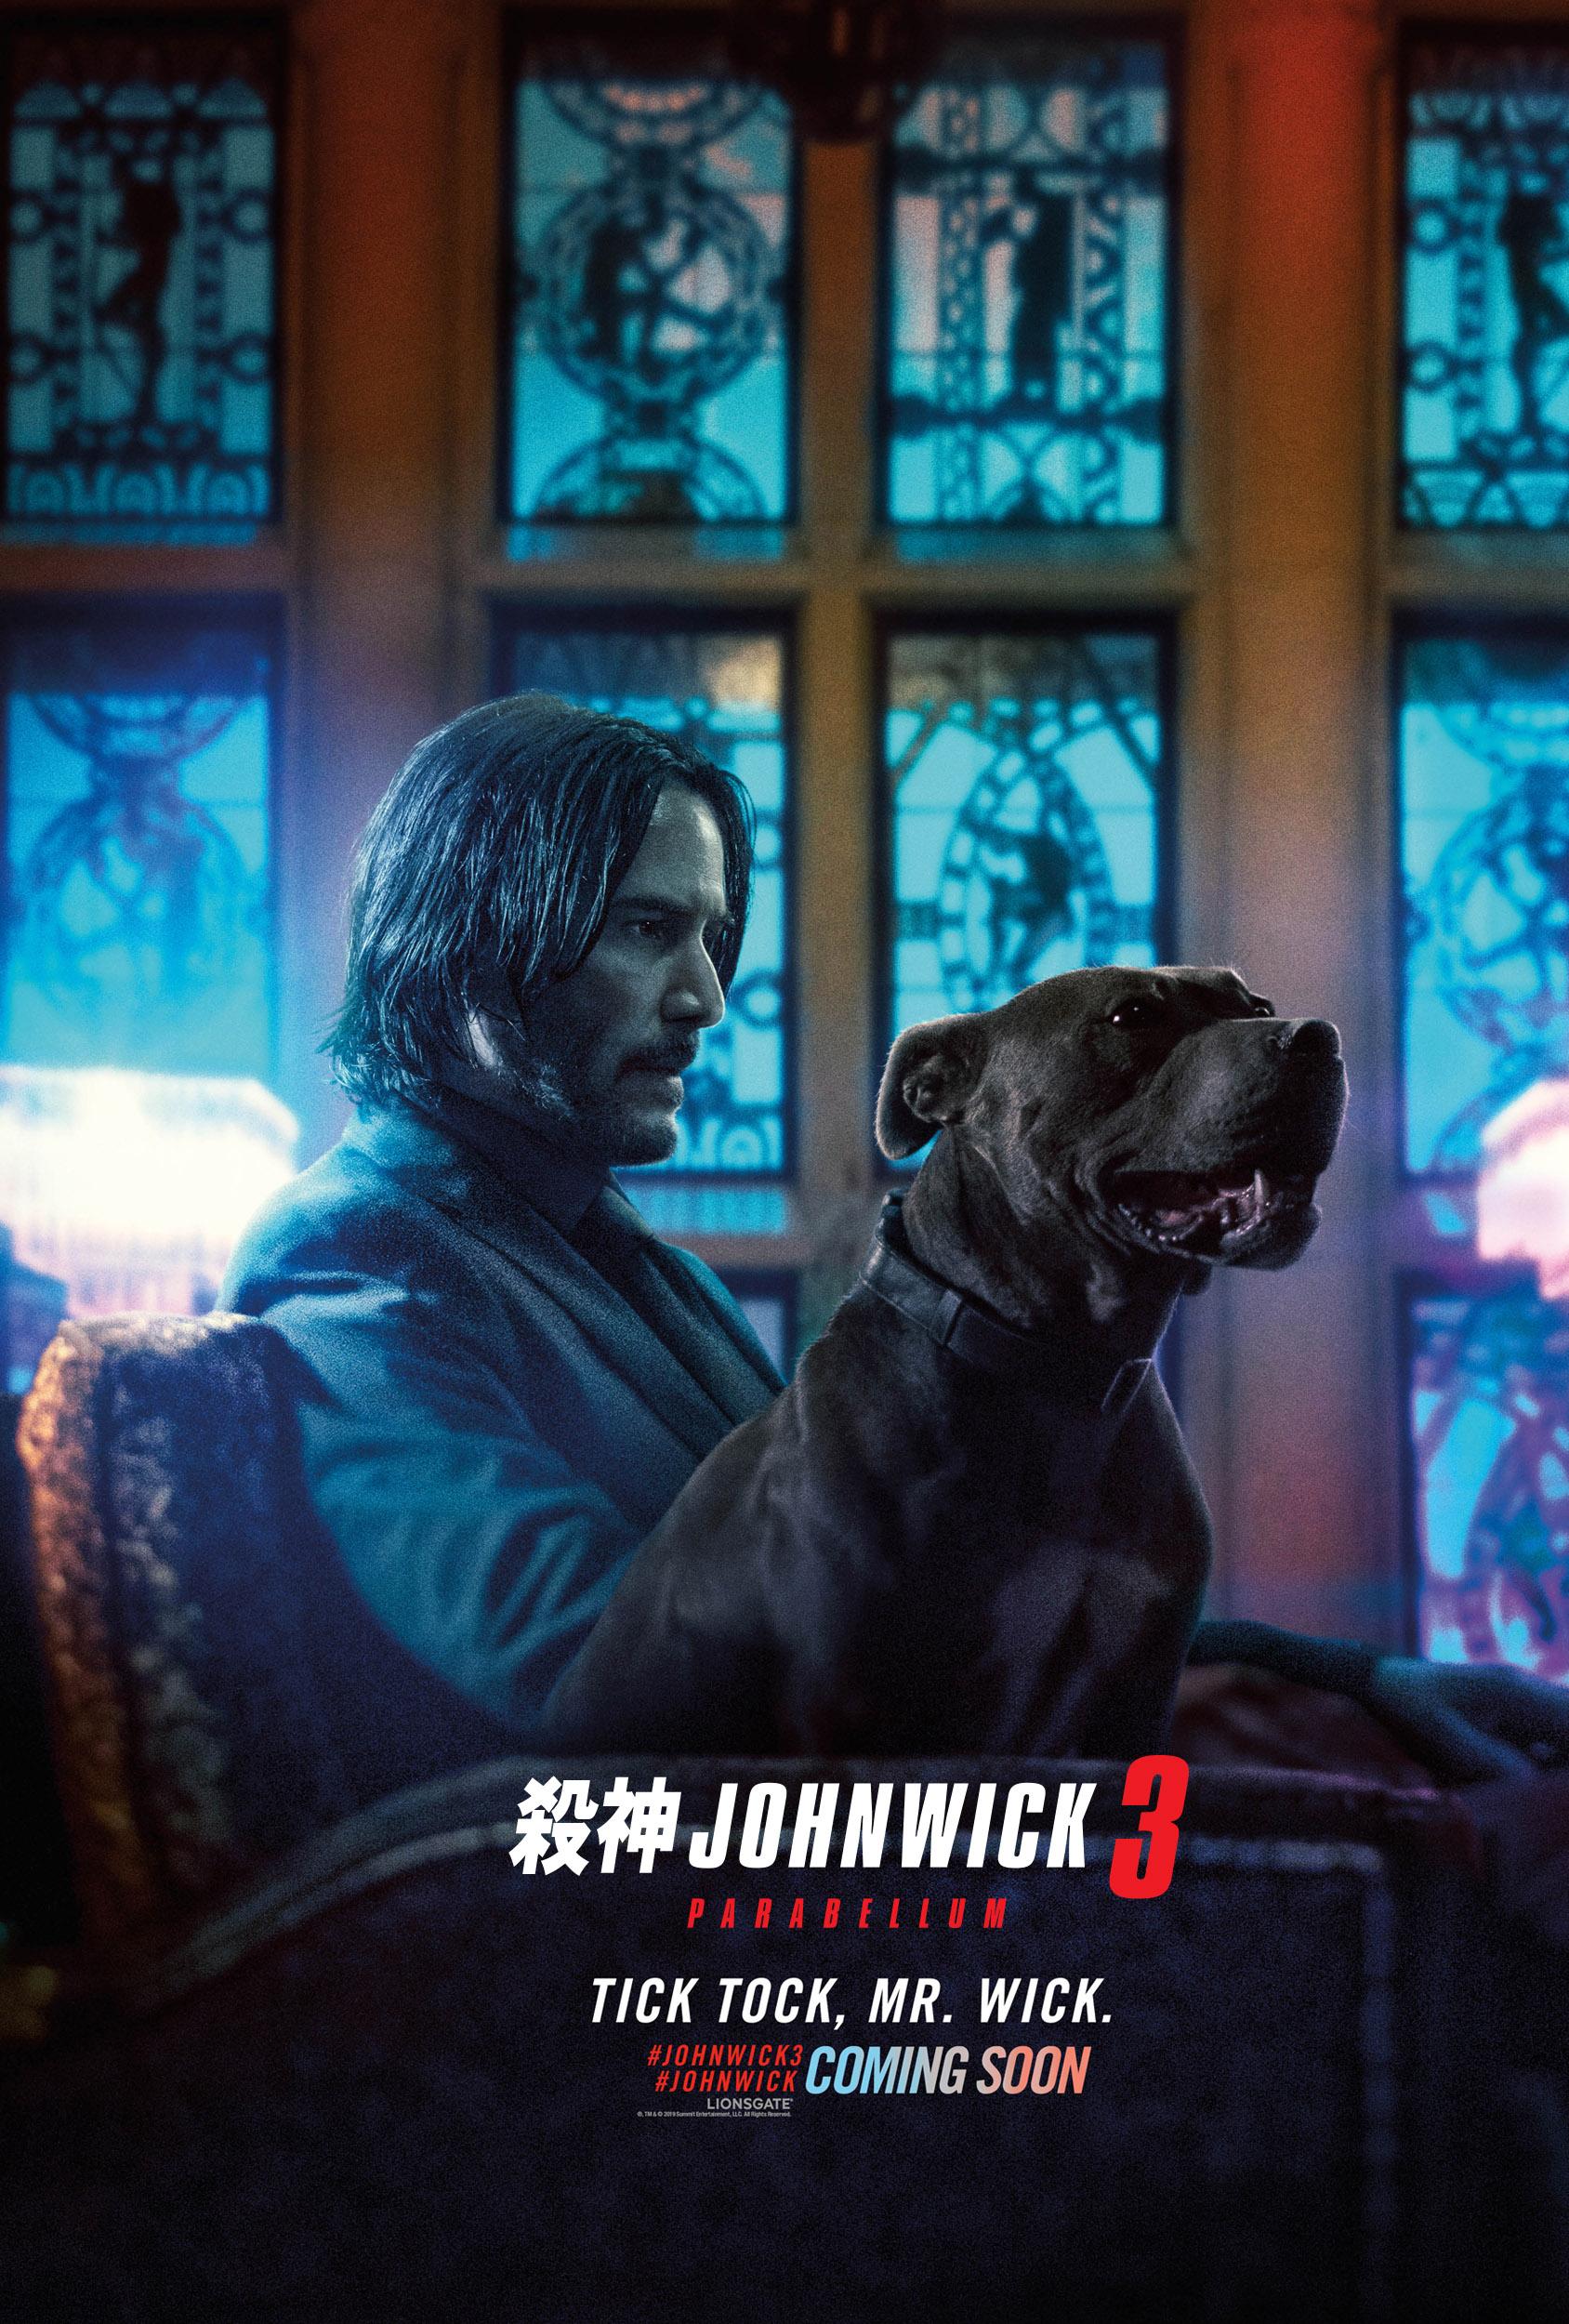 20190322_JohnWick3Parabellum_Poster3.jpg